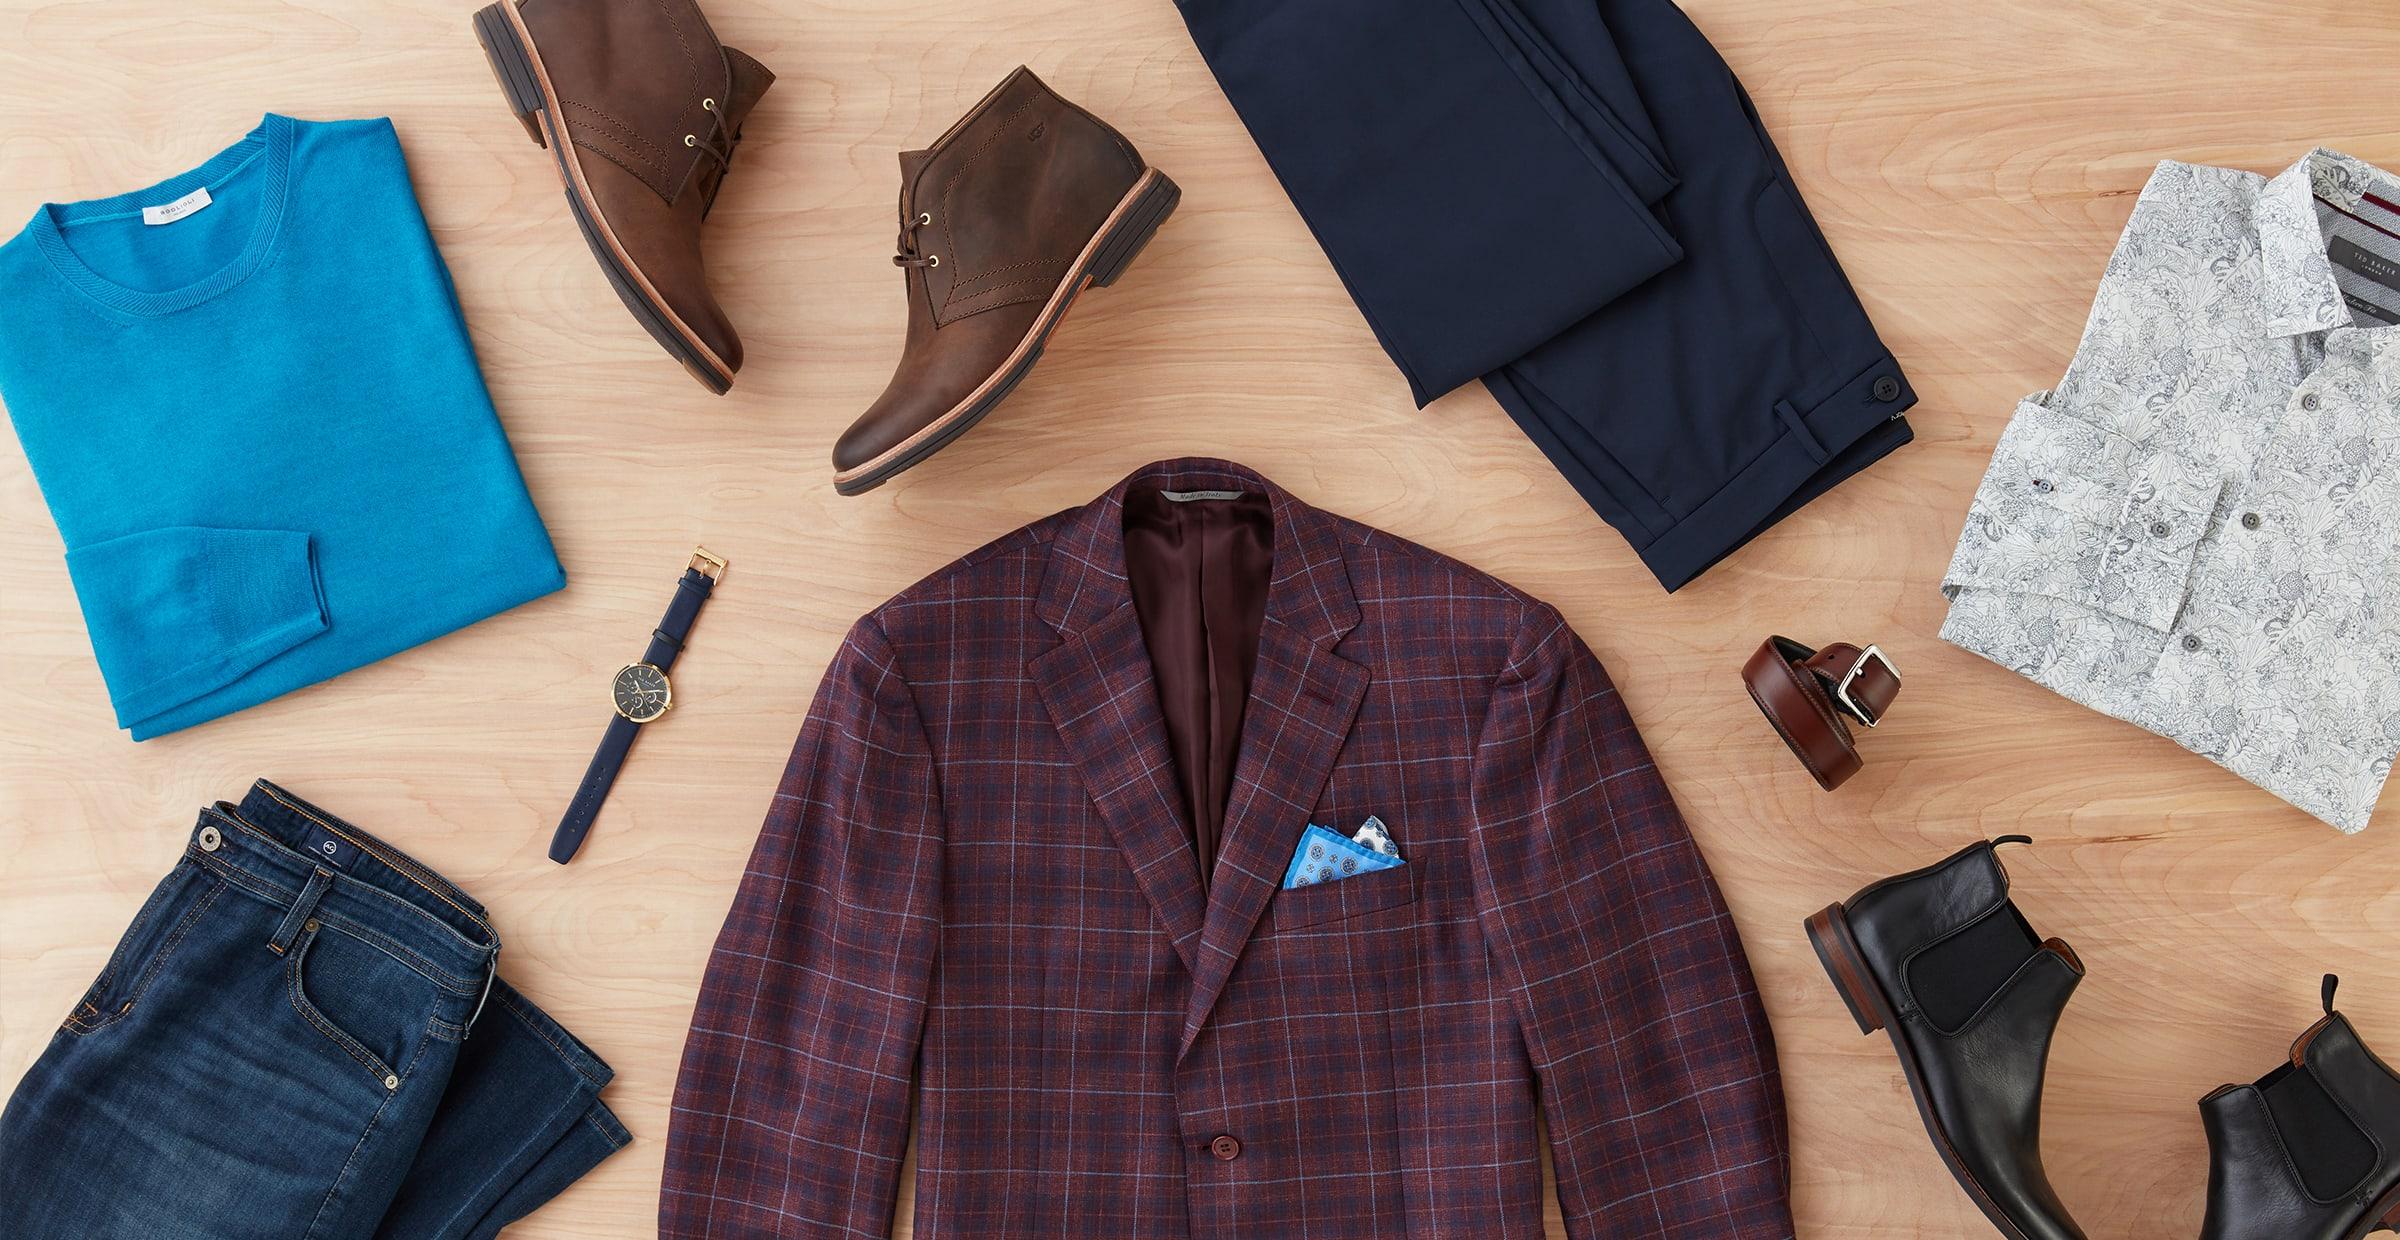 Men's fall clothing essentials